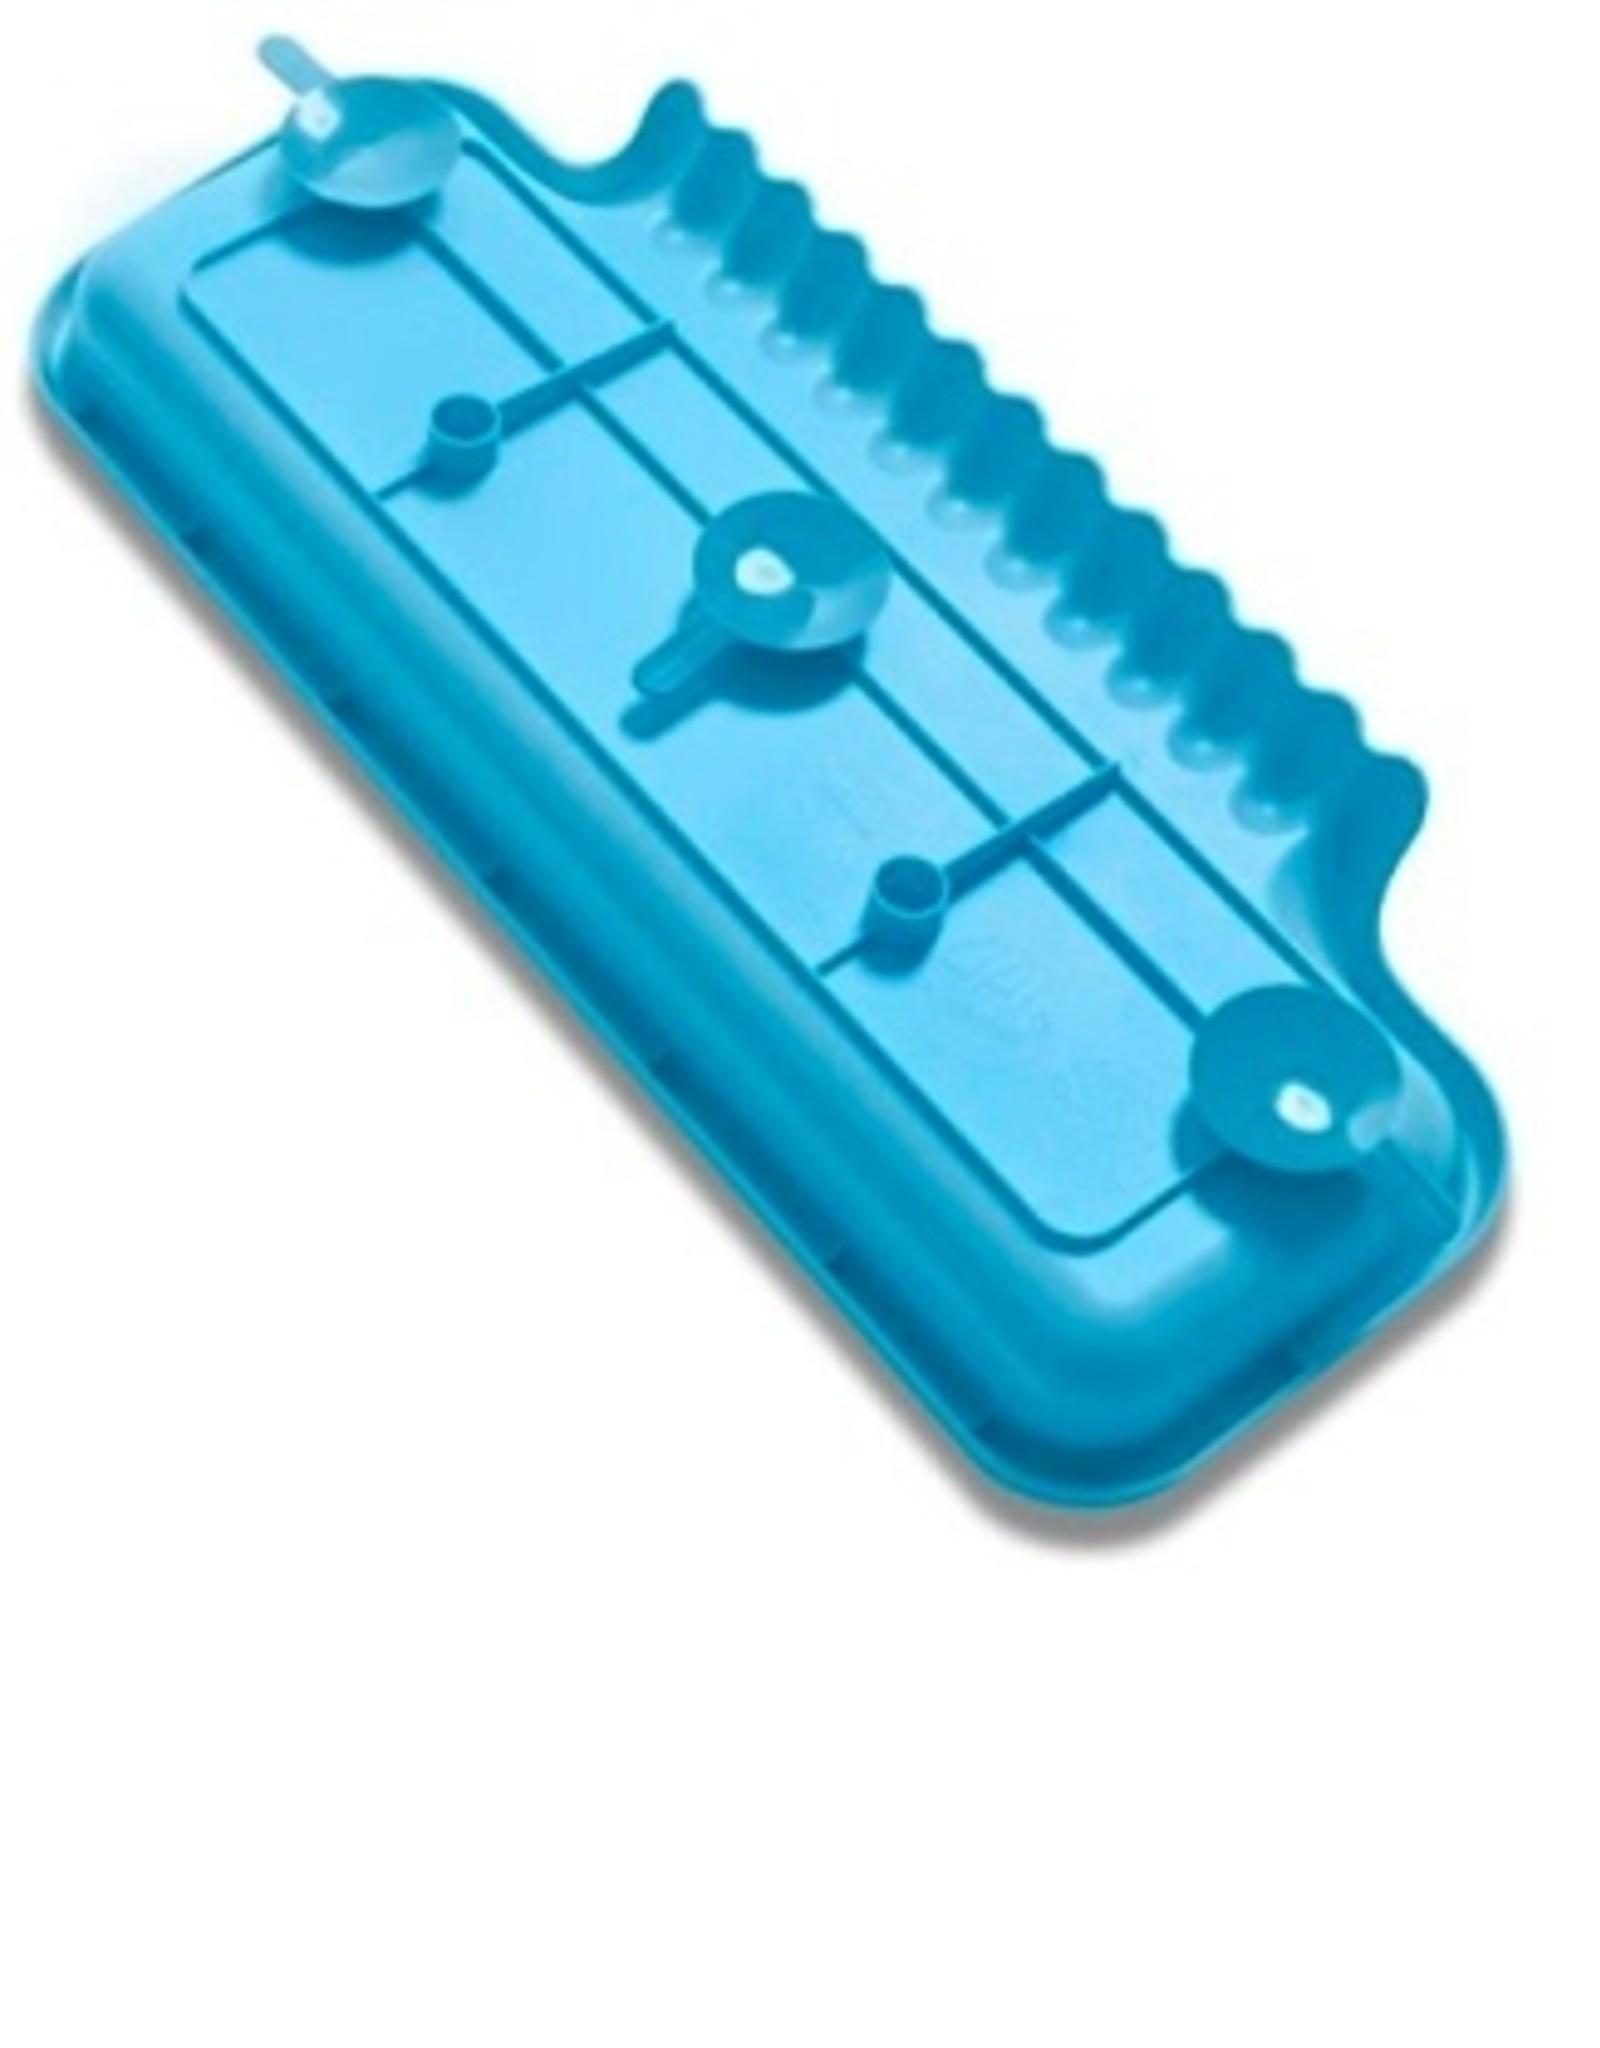 Skip hop Moby shelfie play tray